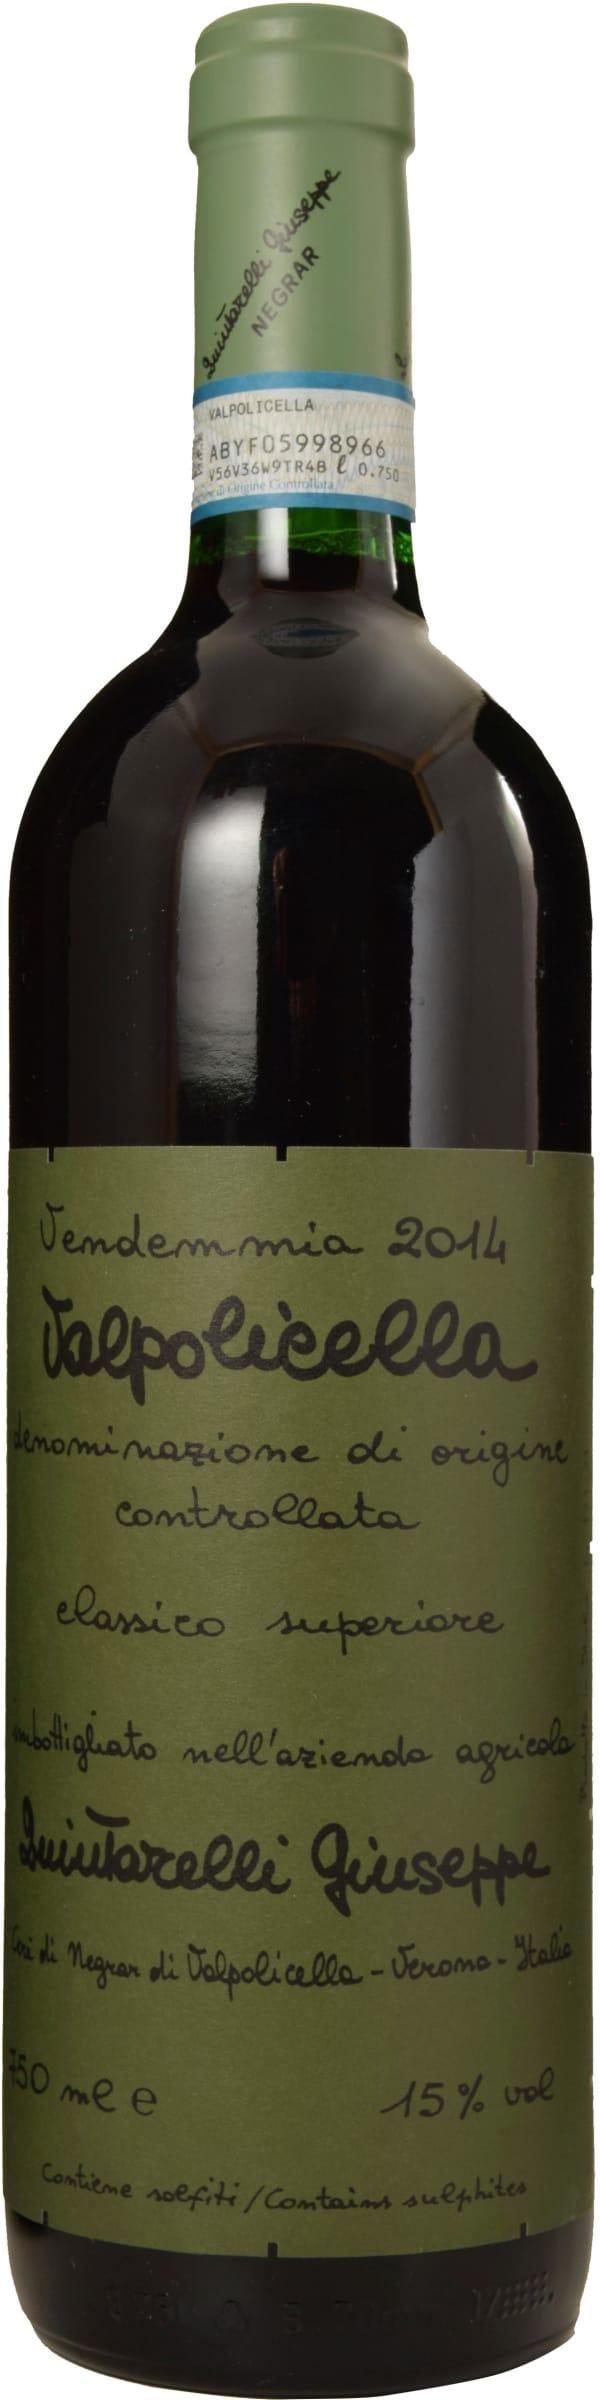 Giuseppe Quintarelli Valpolicella Classico Superiore 2012